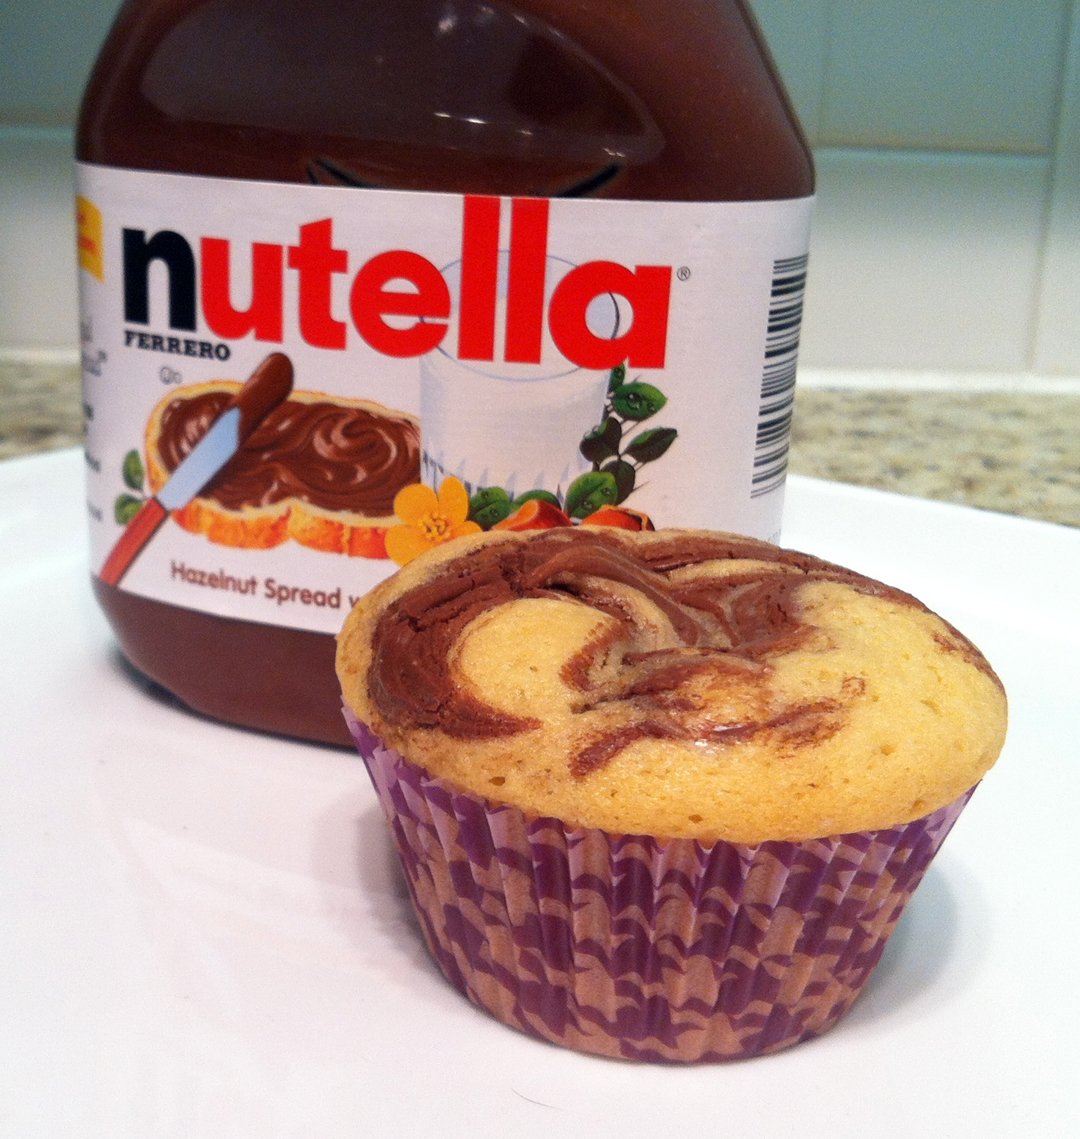 The Great Cupcake Adventure: Nutella Cupcakes